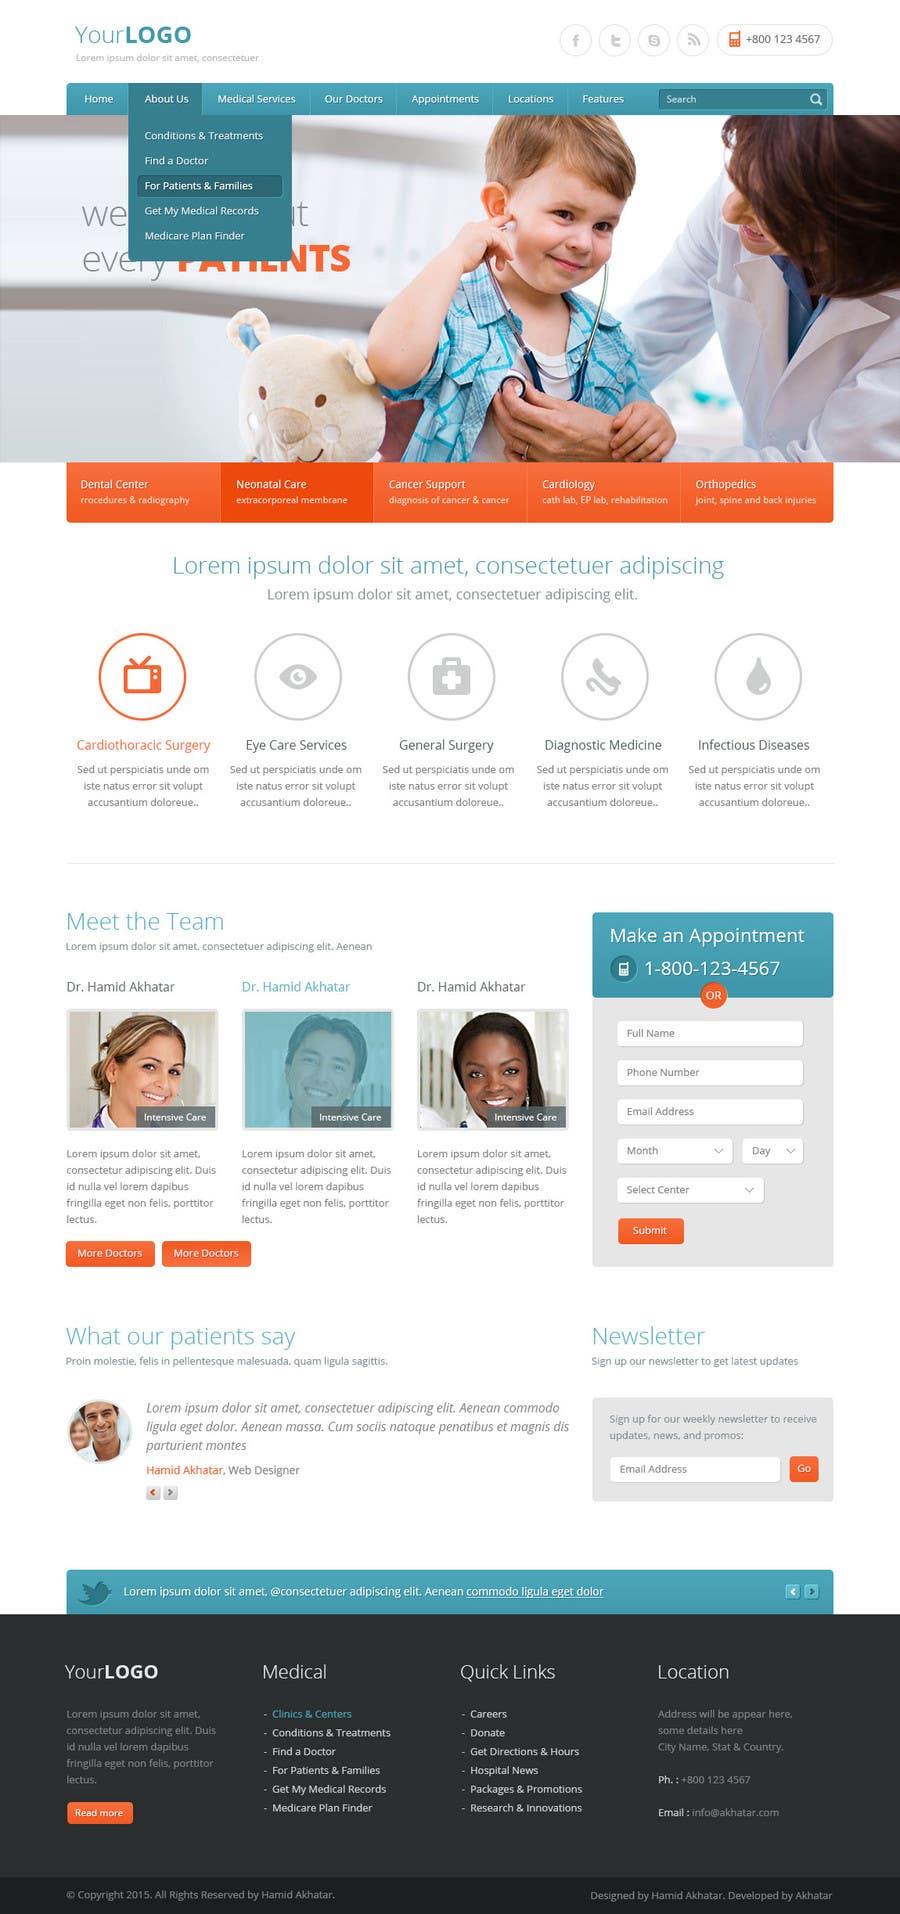 Bài tham dự cuộc thi #5 cho Design a Website Mockup for a surgeon